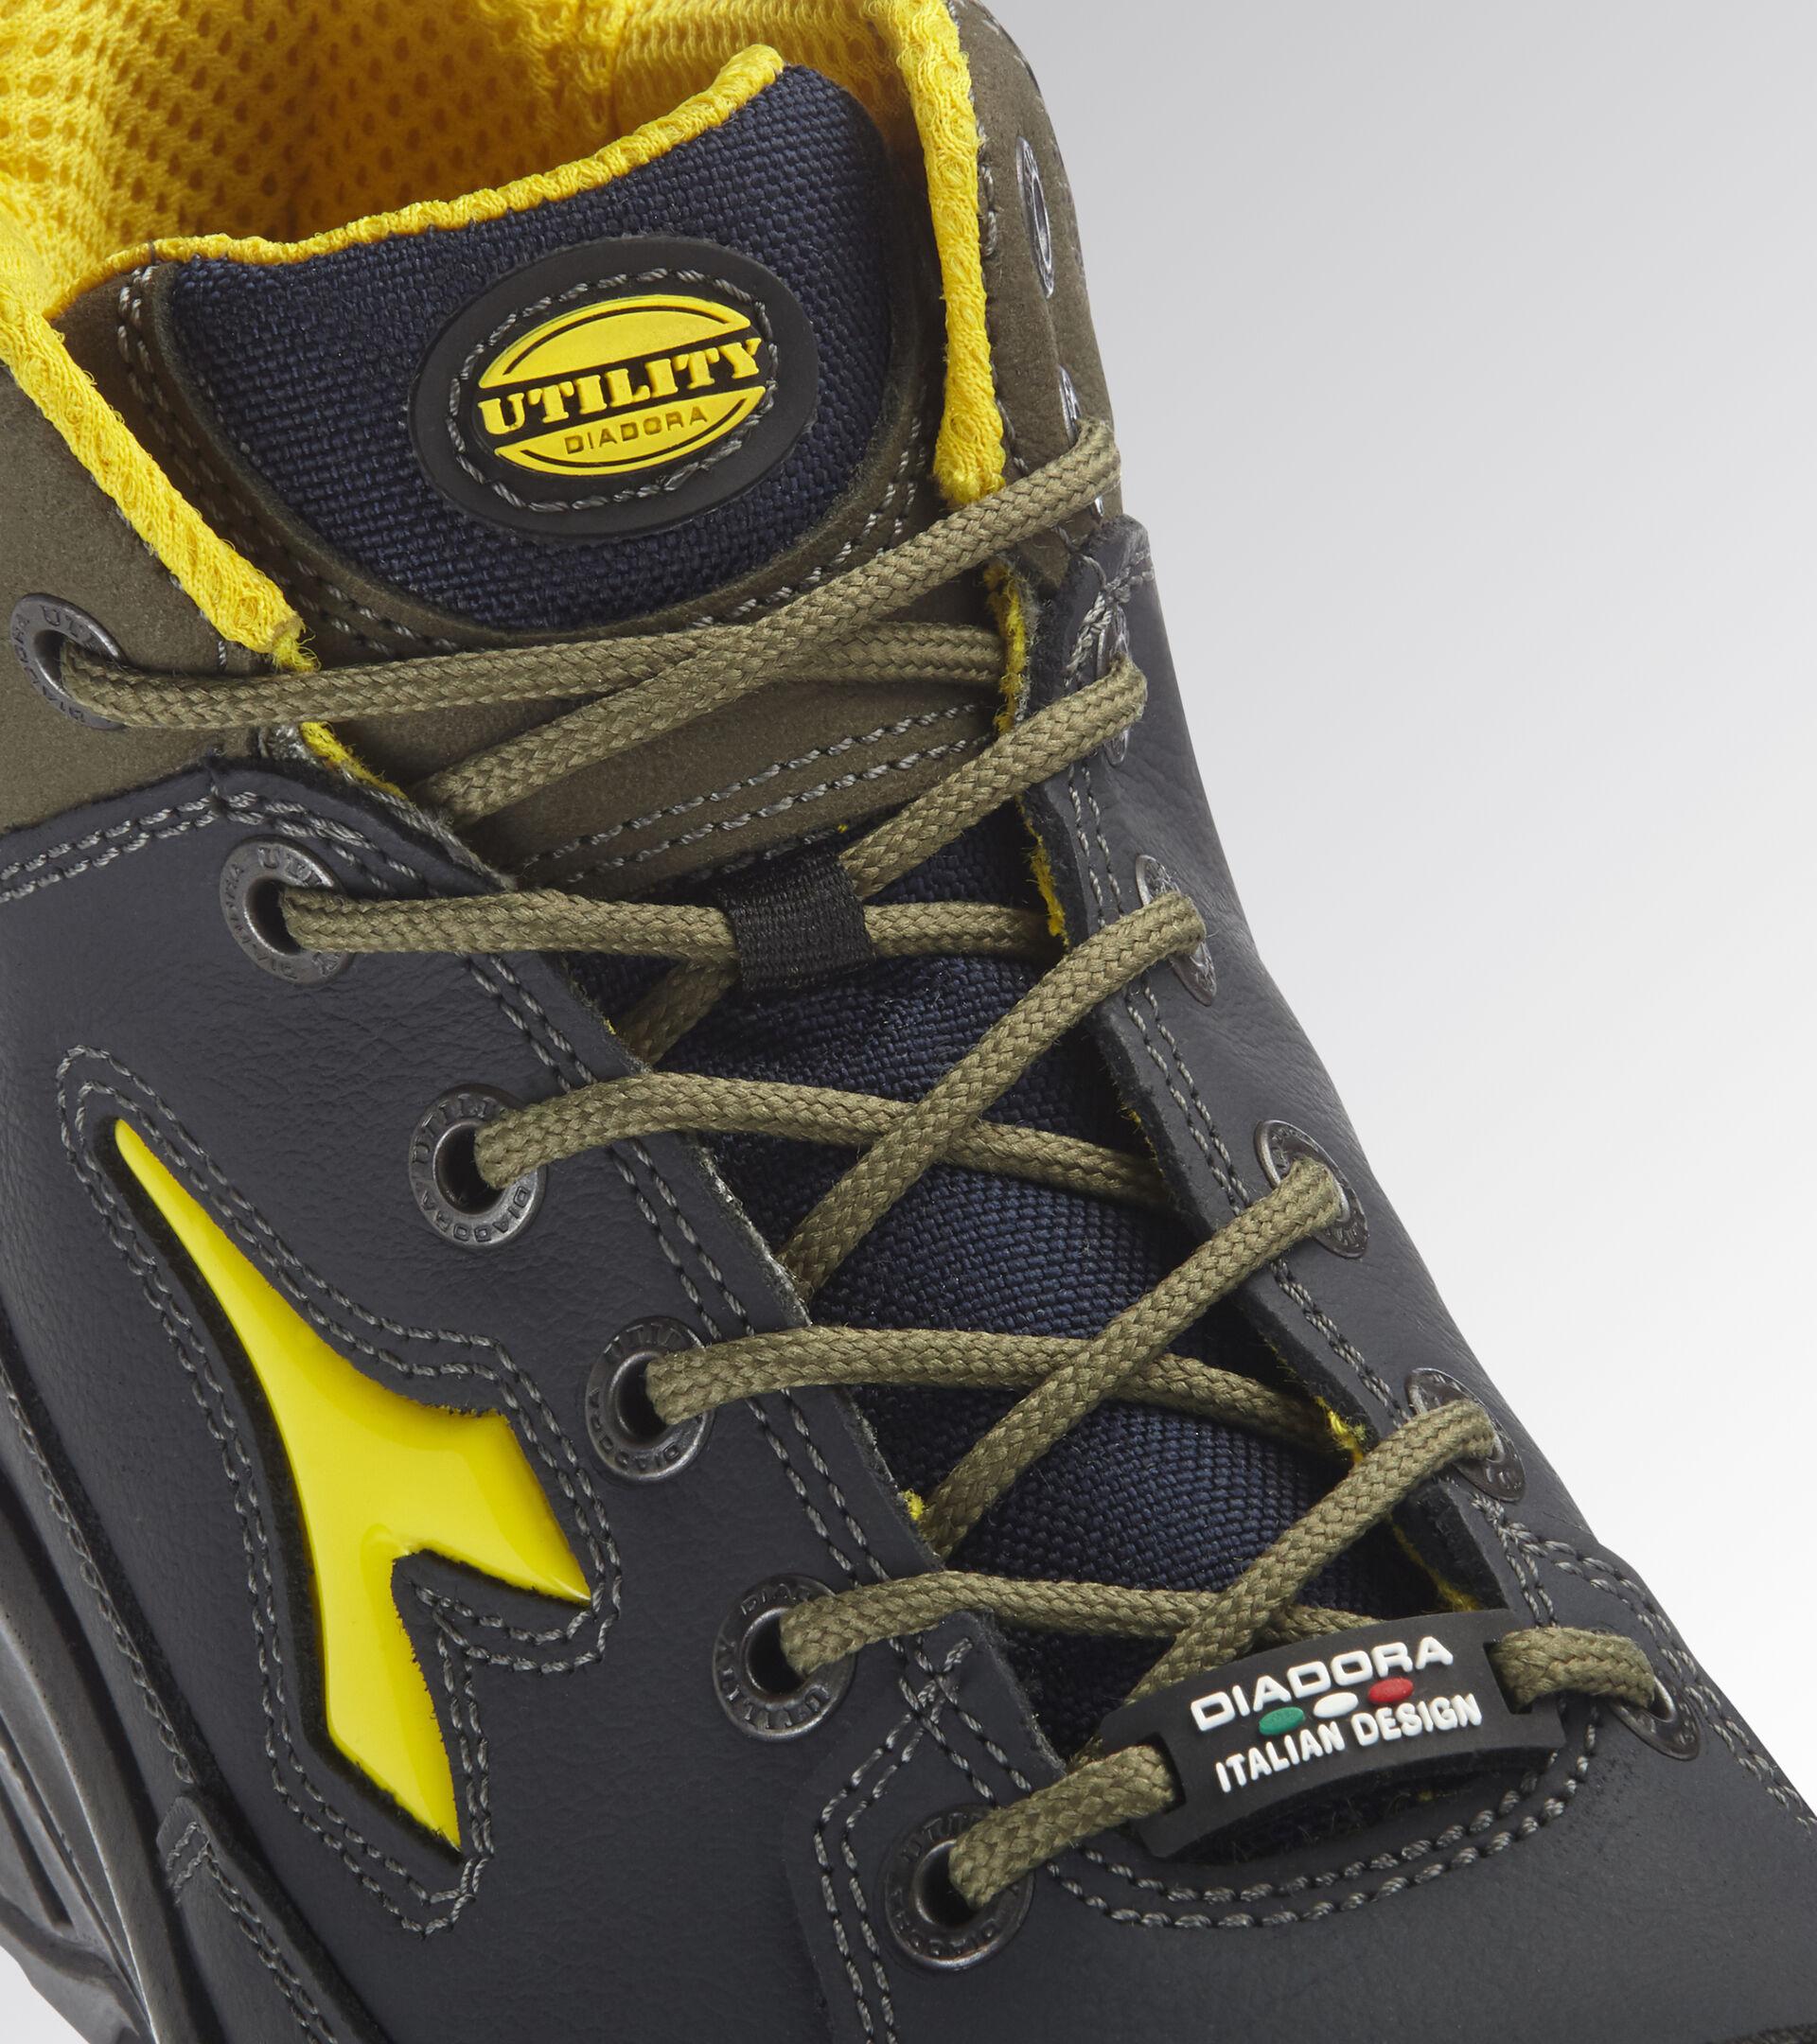 Footwear Utility UNISEX CONTINENTAL MID S3 SRC NAVY/GREEN CONIFER Utility